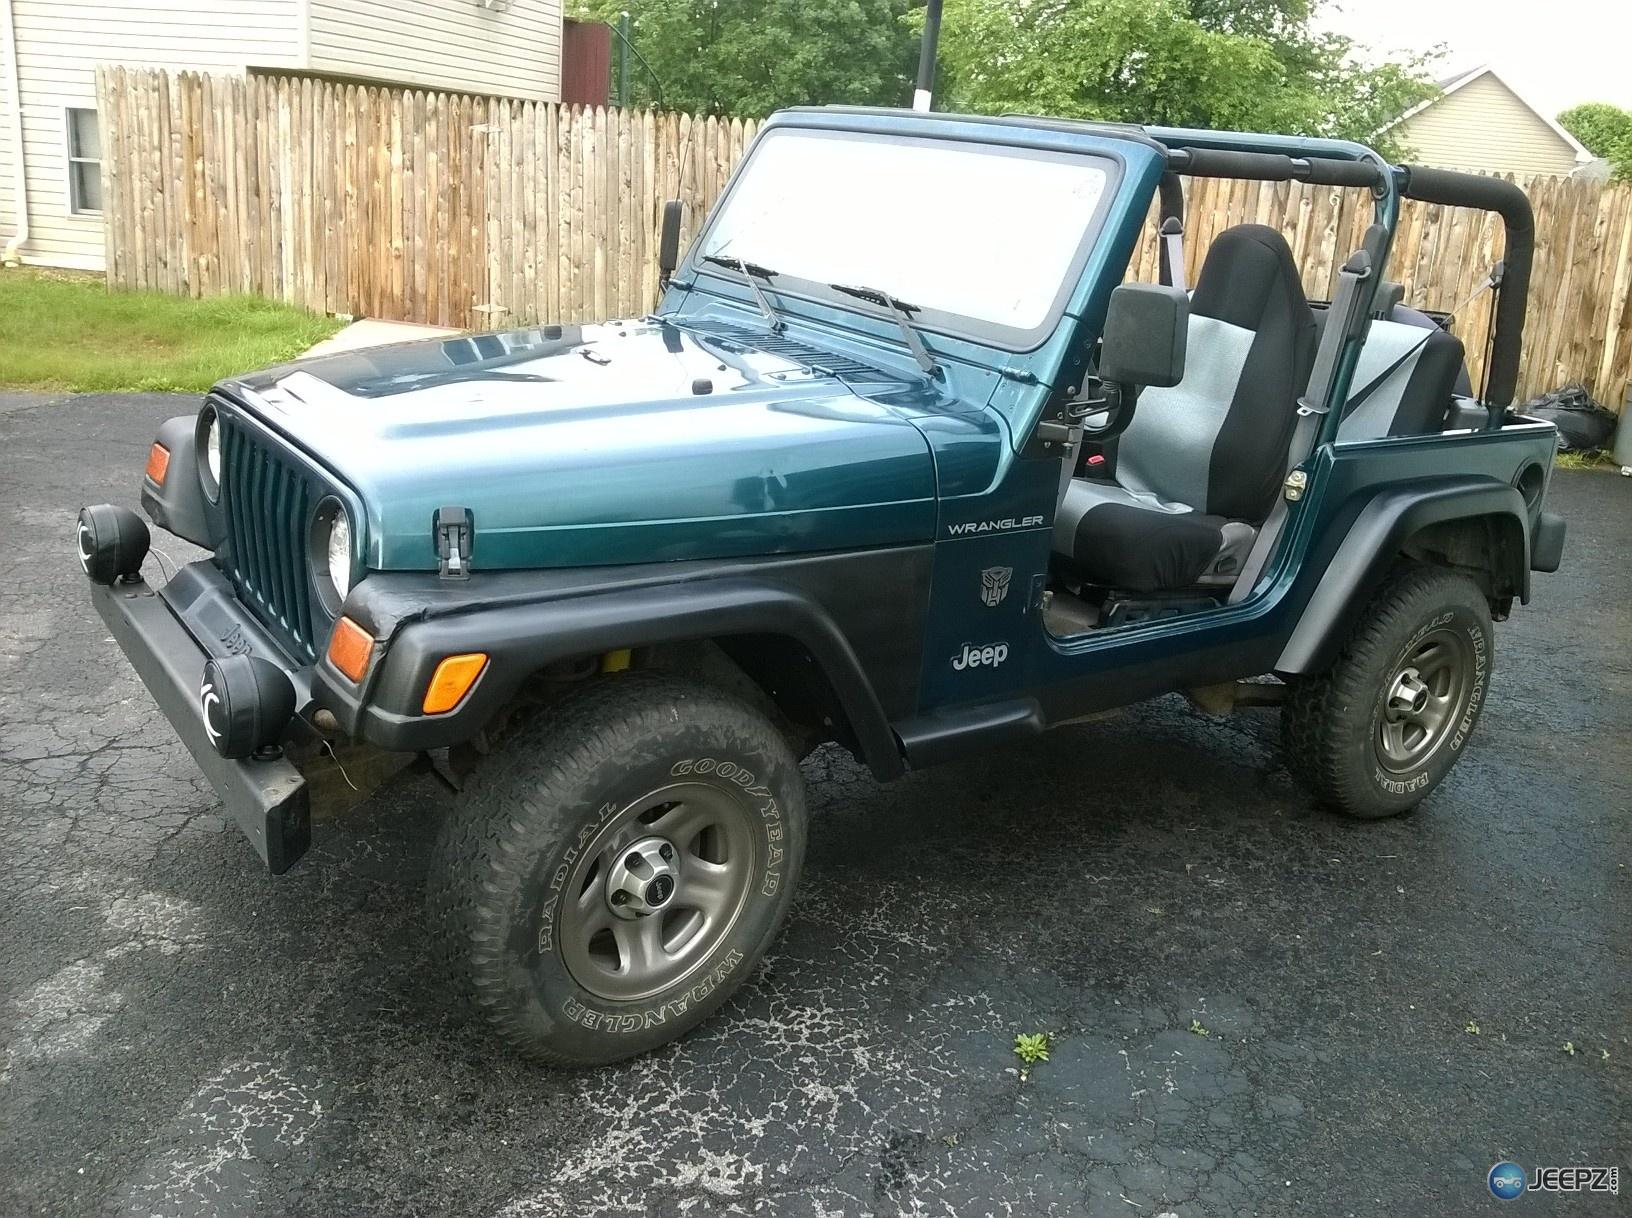 Bond--007 U0026 39 S Jeep Build